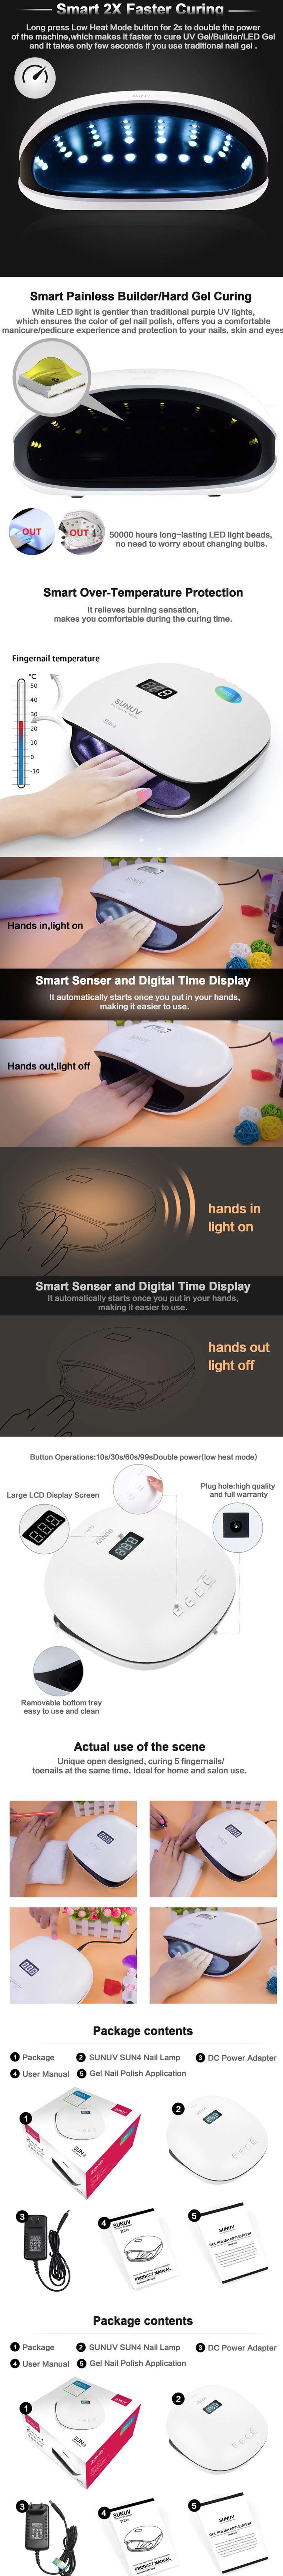 SUNUV SUN4 Professional Manicure 48W Nail Lamp Curing Tool  -  EU PLUG  WHITE  - Manicura profesional -lámpara para uñas de gel - nail art - #nailart